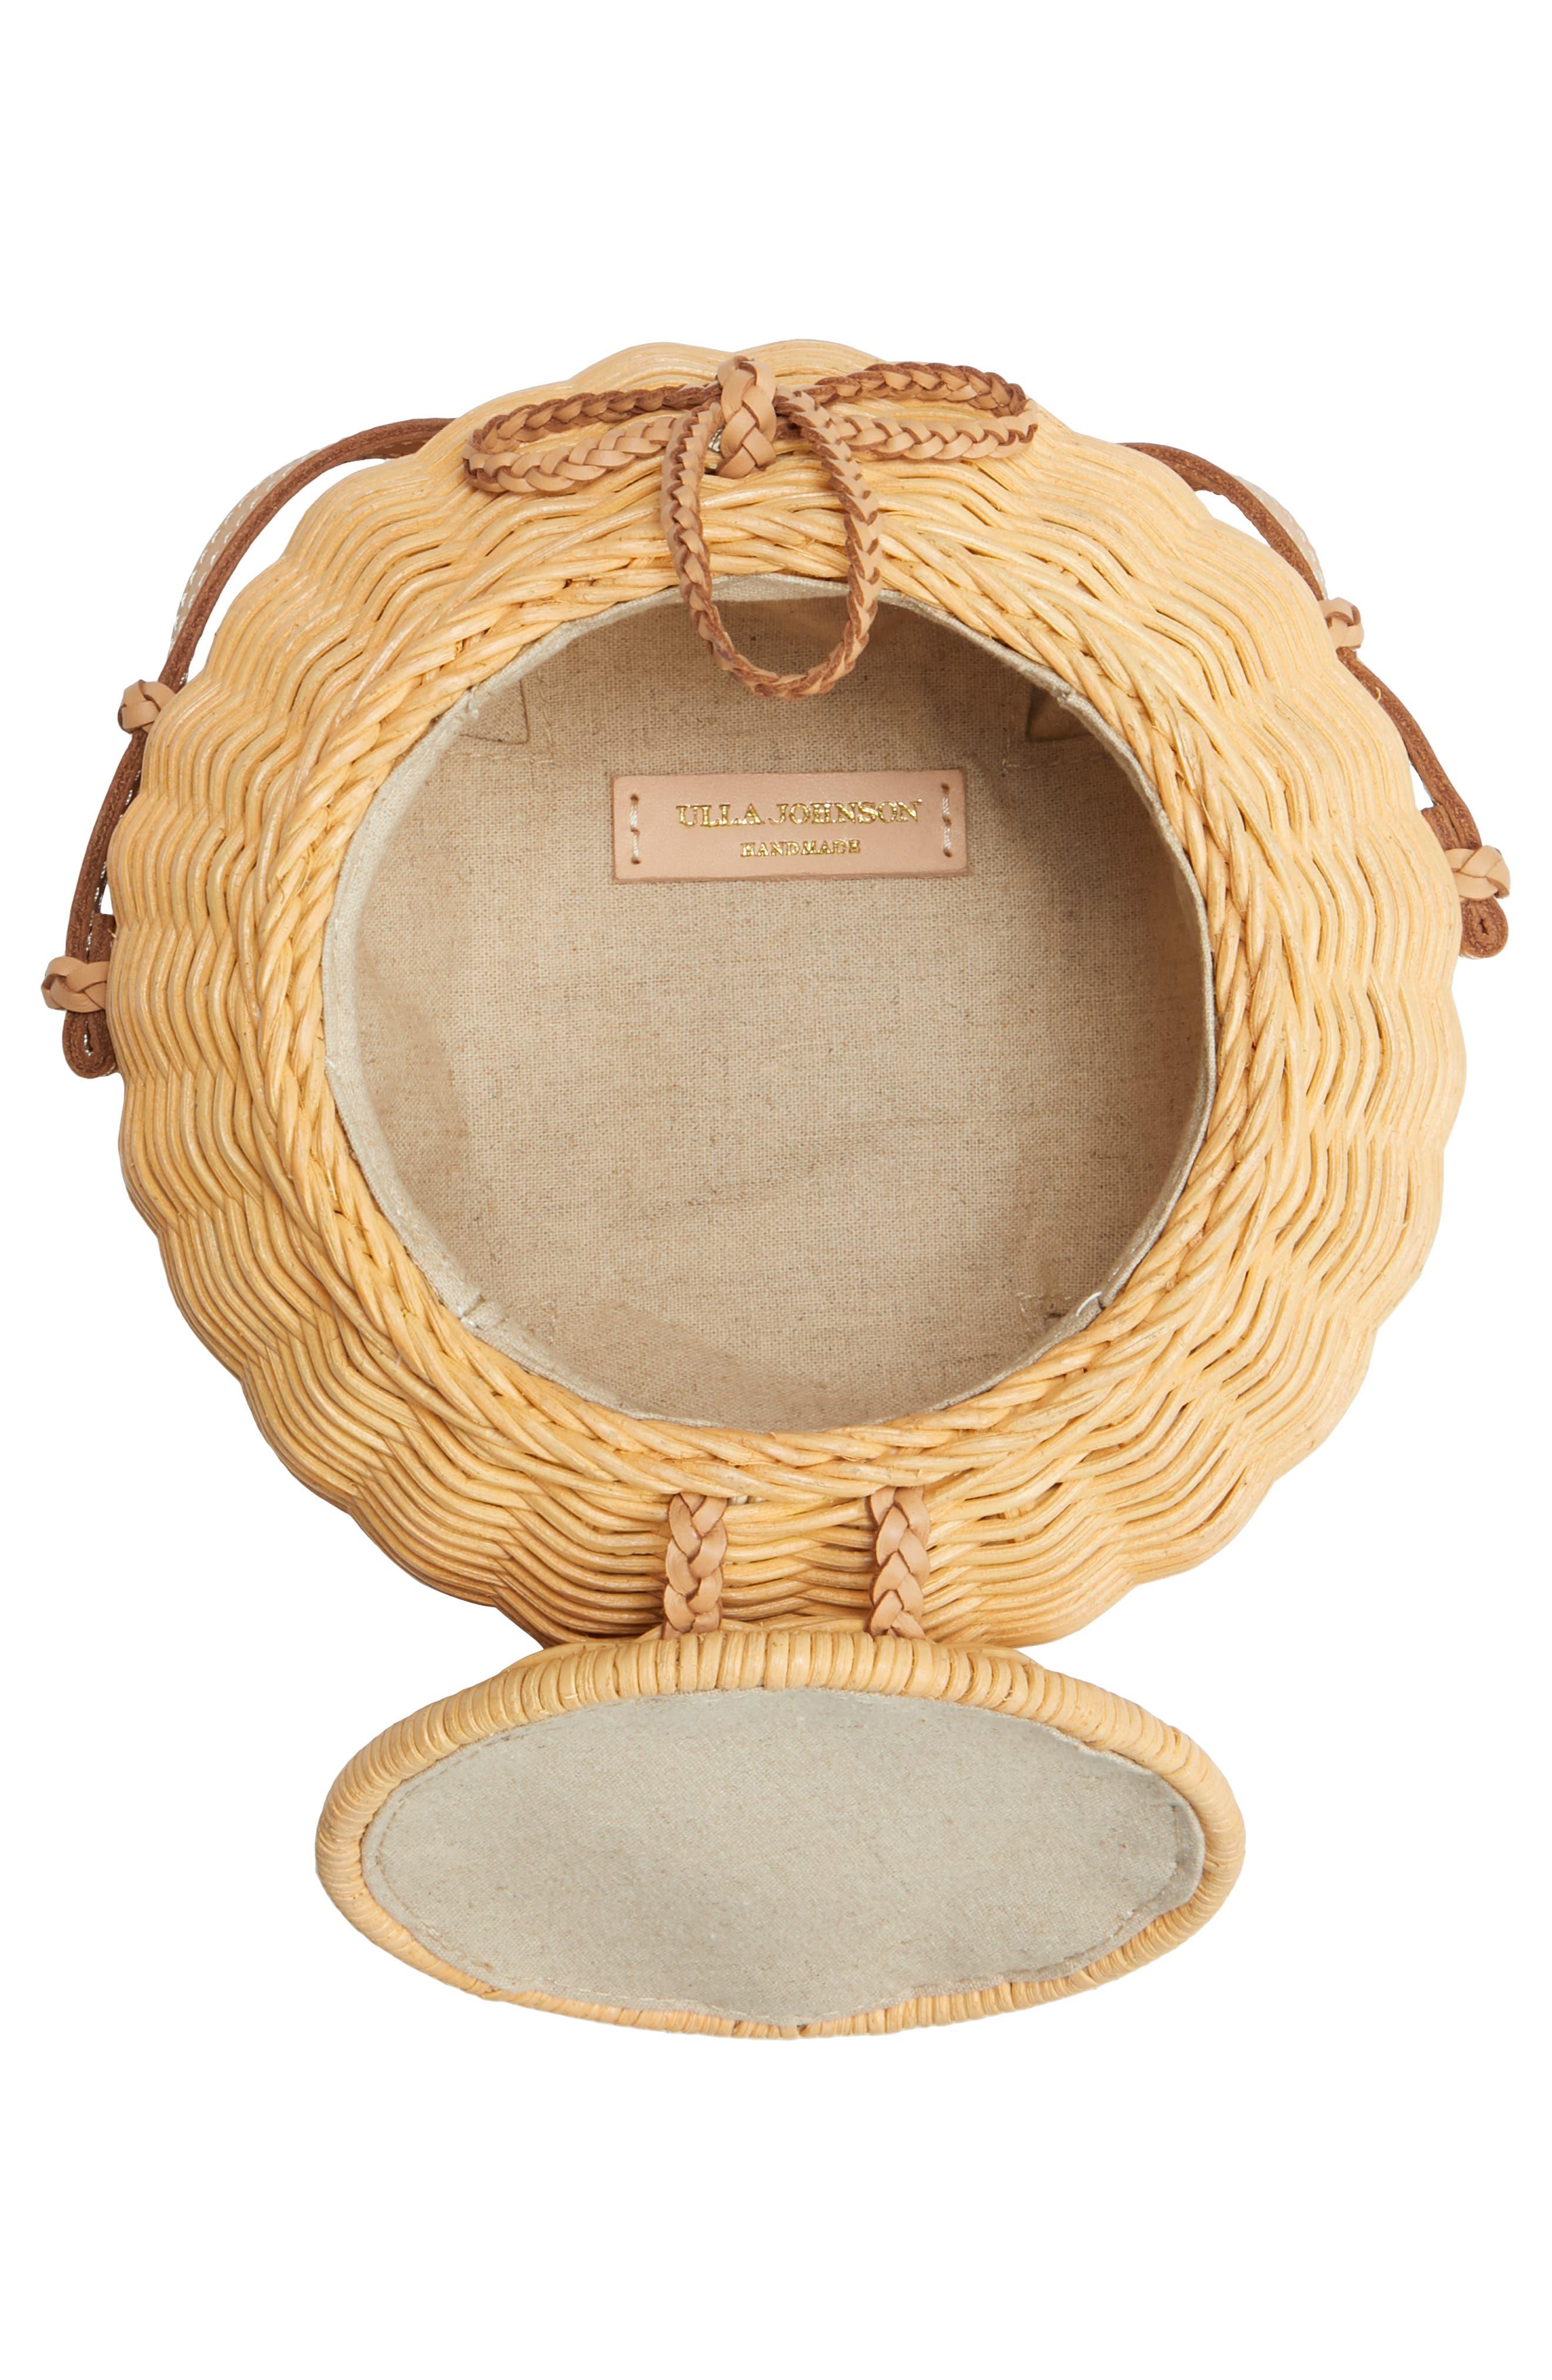 ULLA JOHNSON,                             Pomme Woven Rattan Shoulder Bag,                             Alternate thumbnail 4, color,                             NATURAL